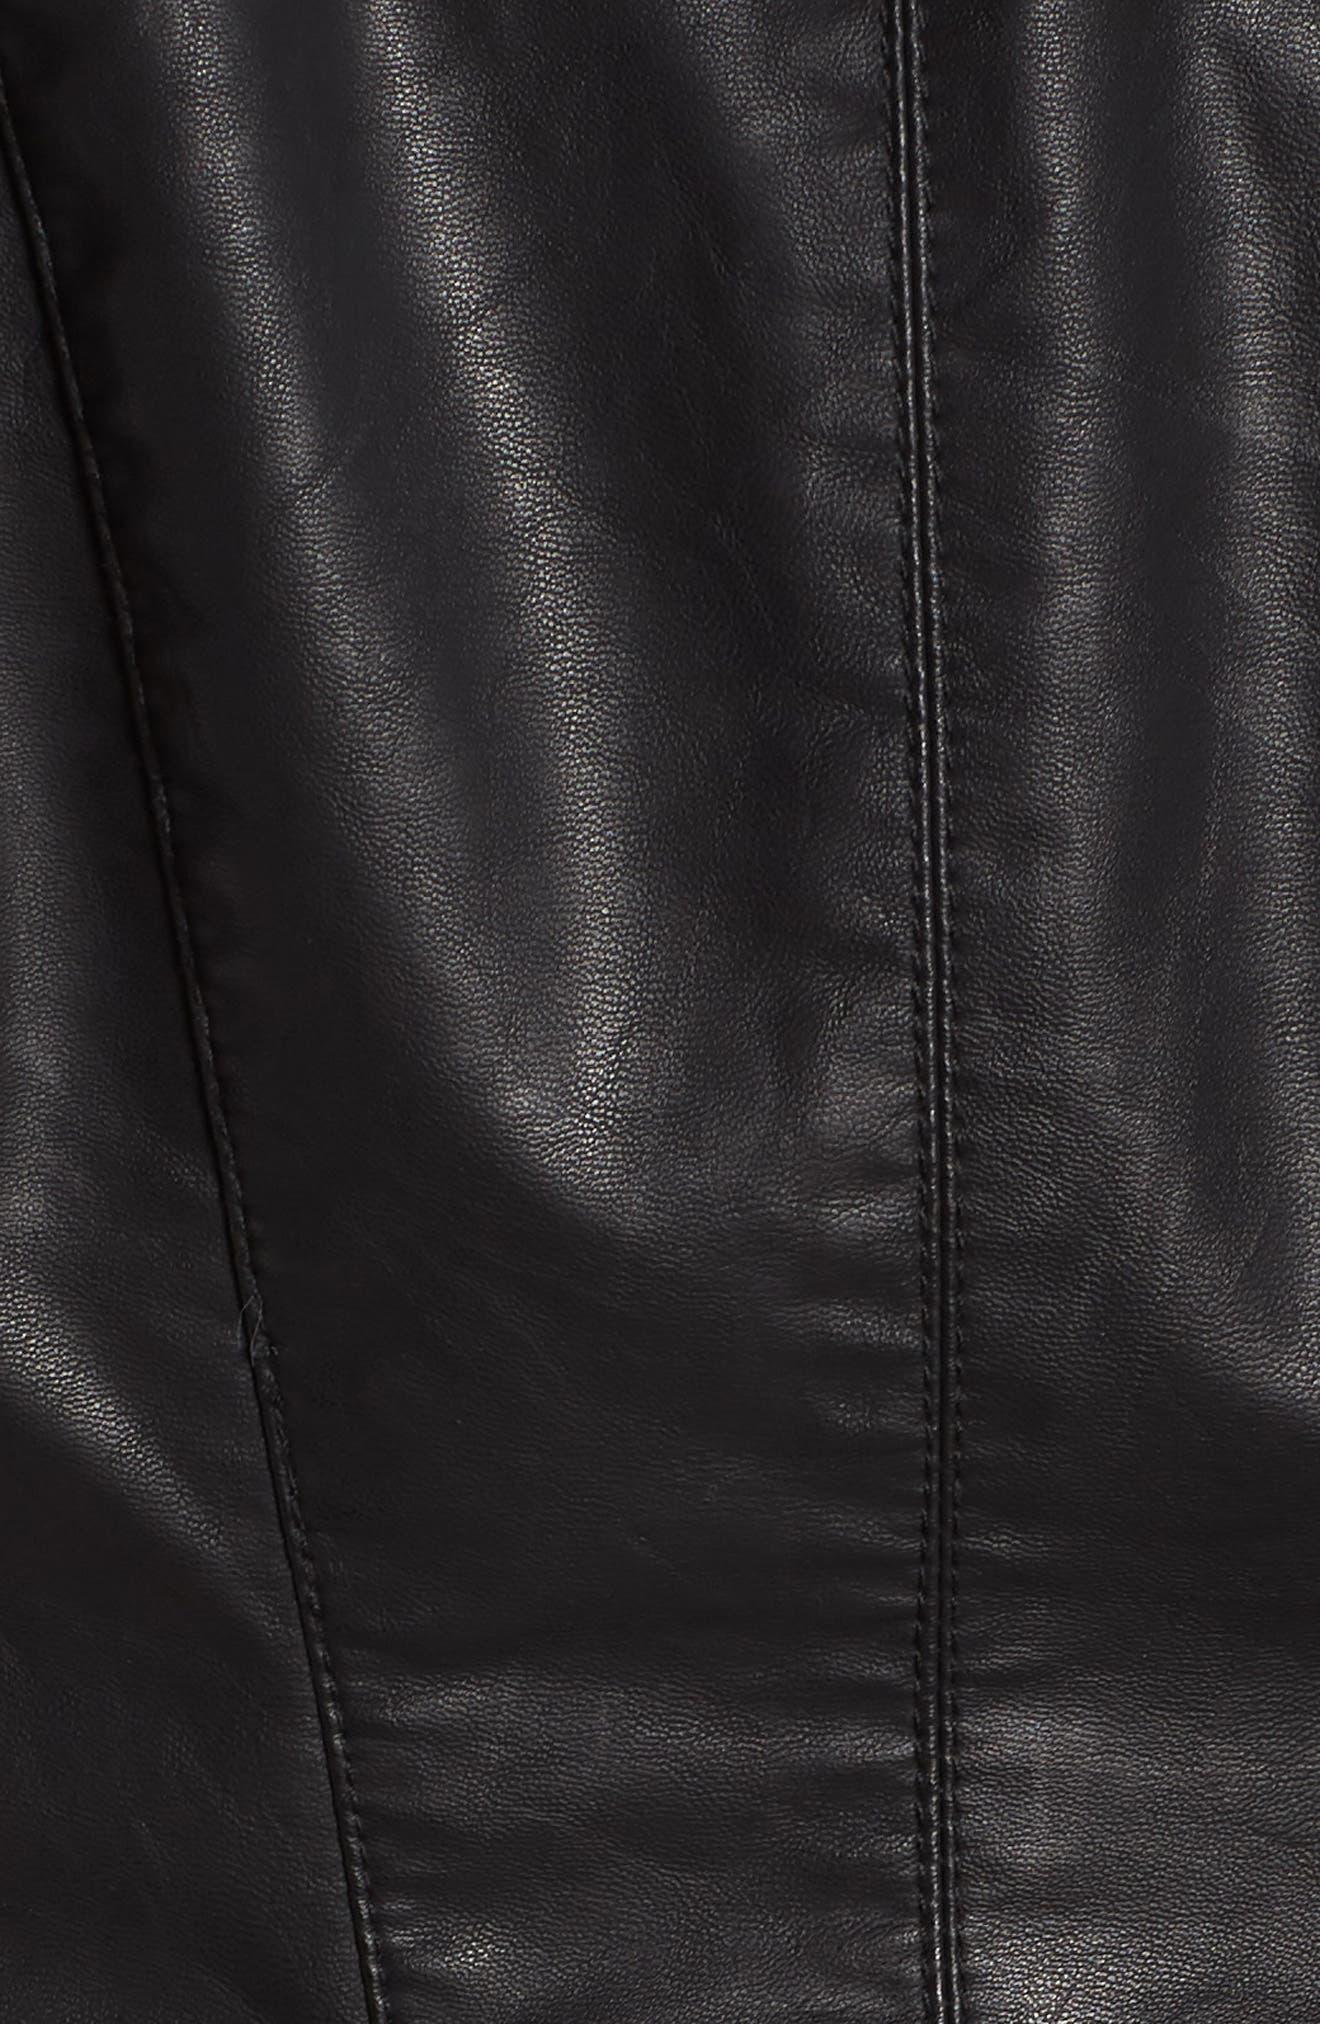 BLANKNYC, Faux Leather Moto Jacket, Alternate thumbnail 8, color, BLACK